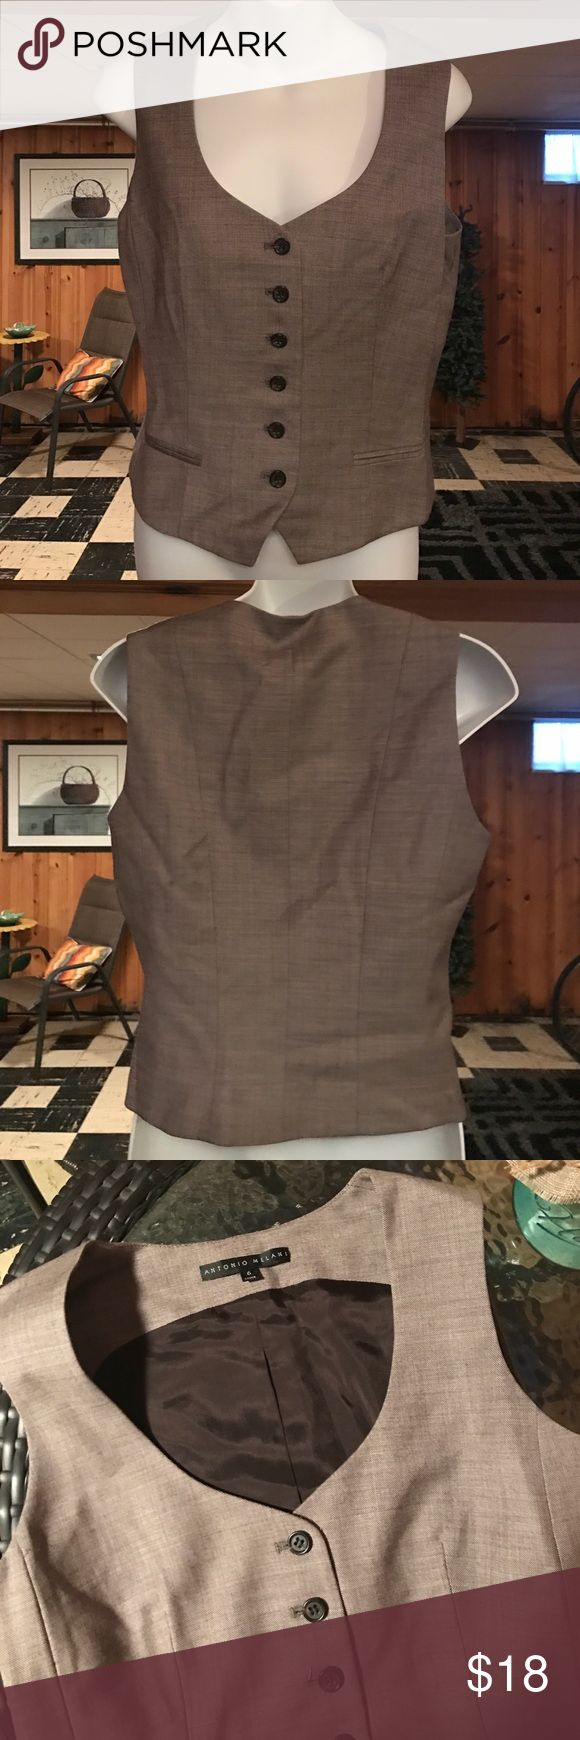 Like new Antonio Melani brown vest Like new Antonio Melani brown vest with 2 front pockets that are stitched closed ANTONIO MELANI Jackets & Coats Vests